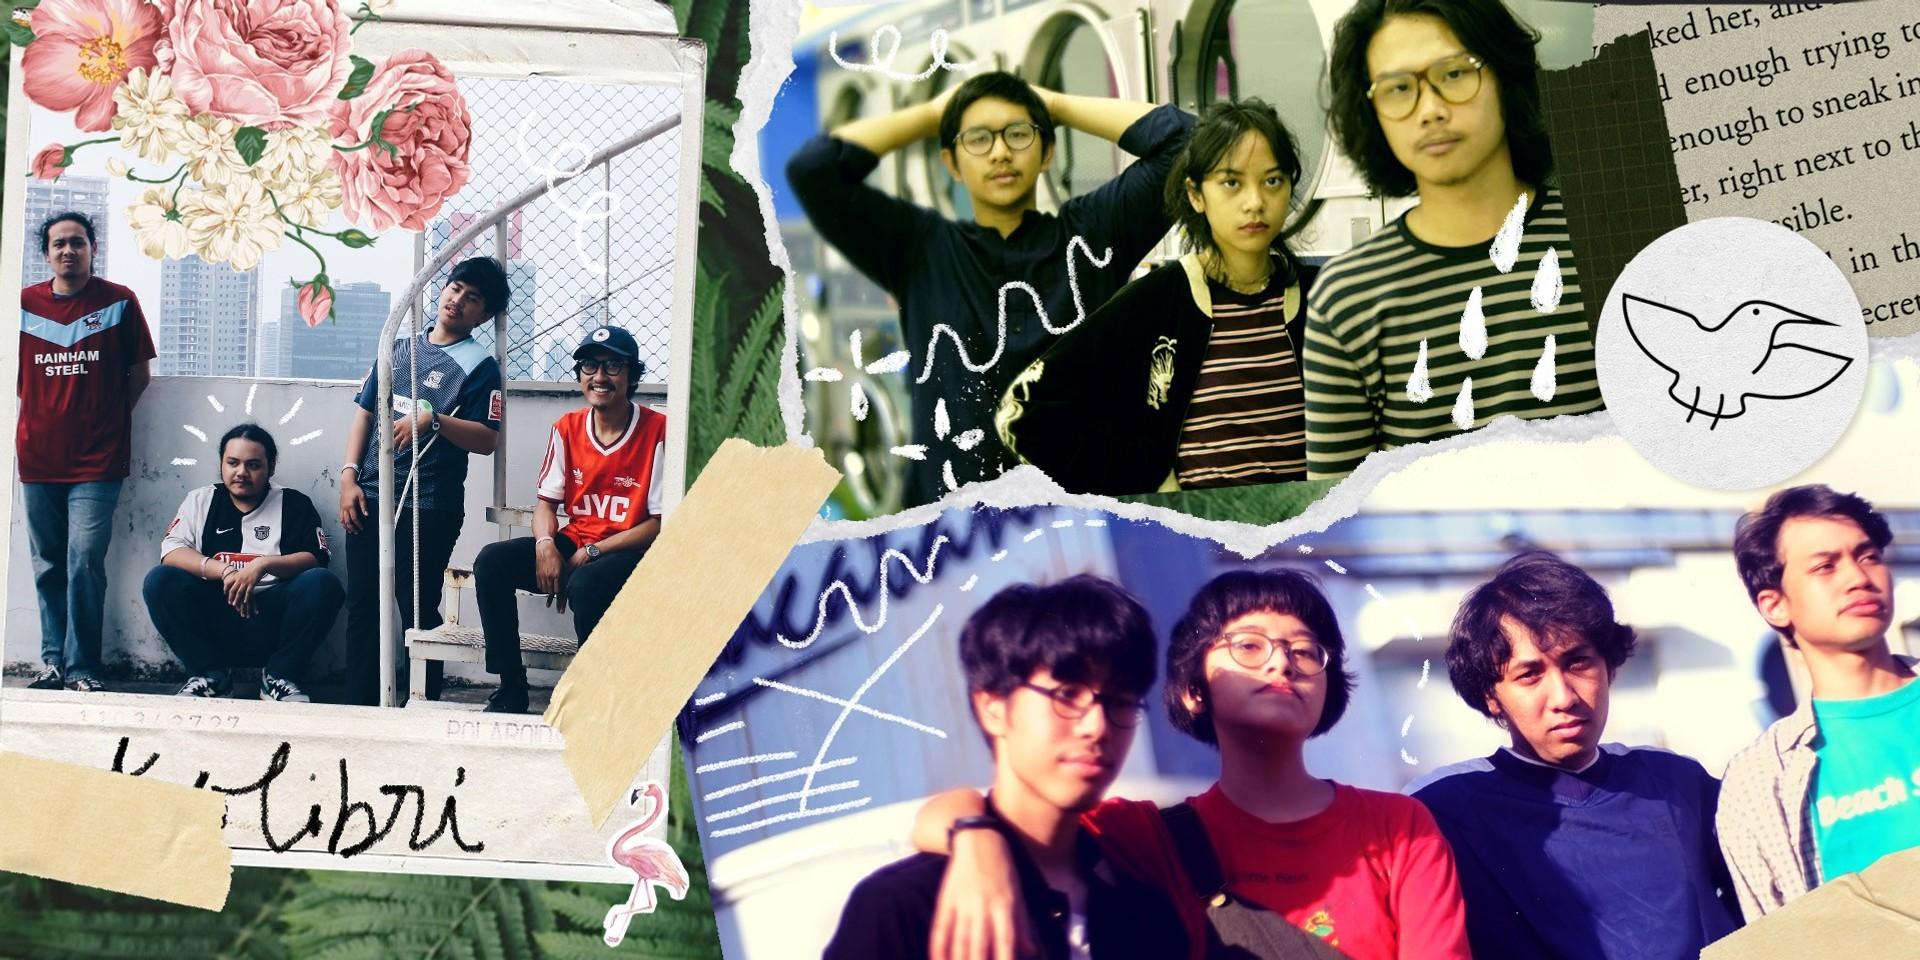 Bedchamber, Gizpel, Grrrl Gang talk music, Kolibri Rekords, favorite Filipino artists, upcoming Manila show